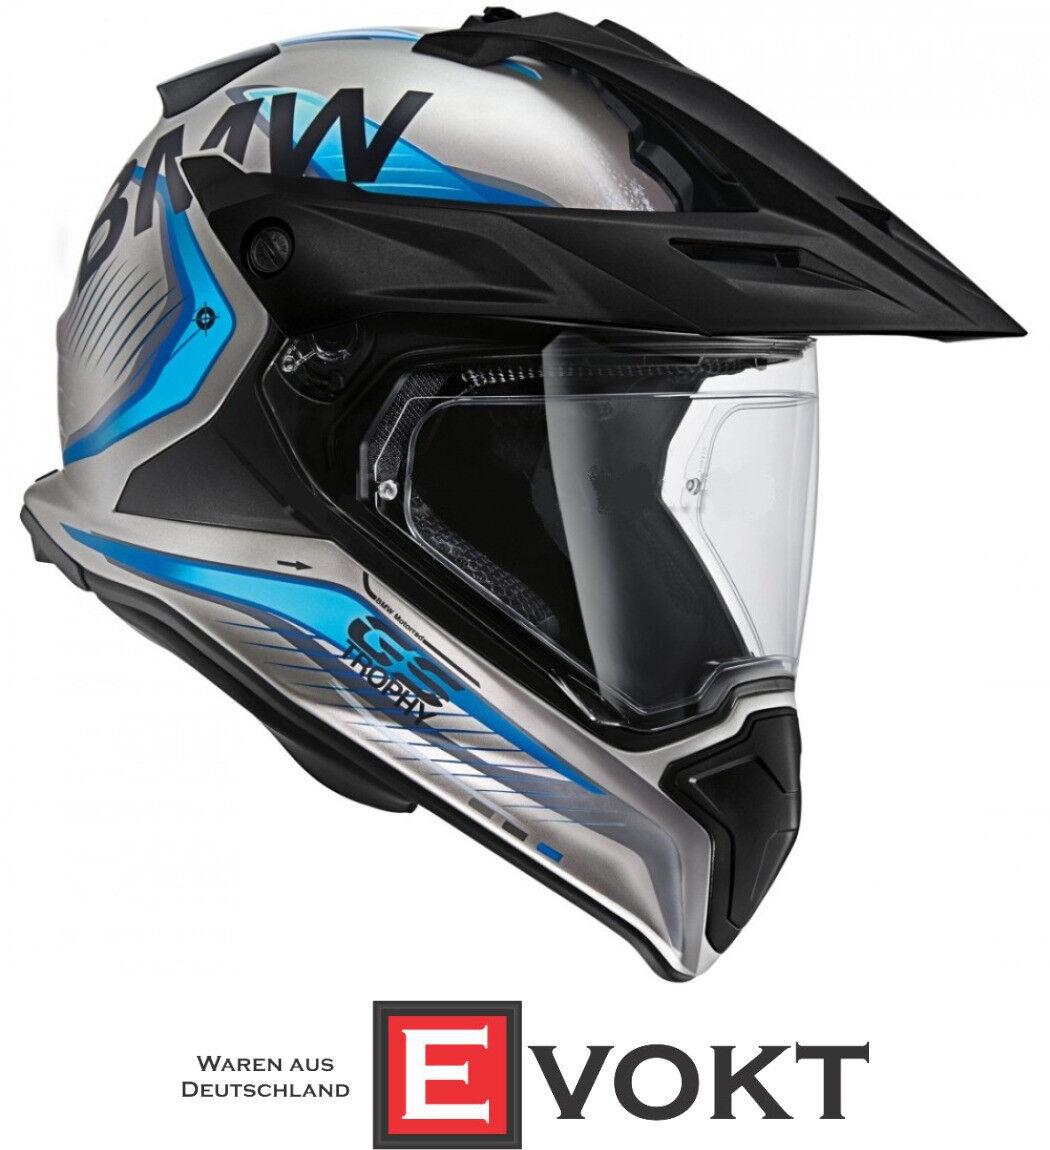 BMW Motor Bike Helmet GS Carbon Trophy Size  58 59 76318553020 Genuine New  is discounted